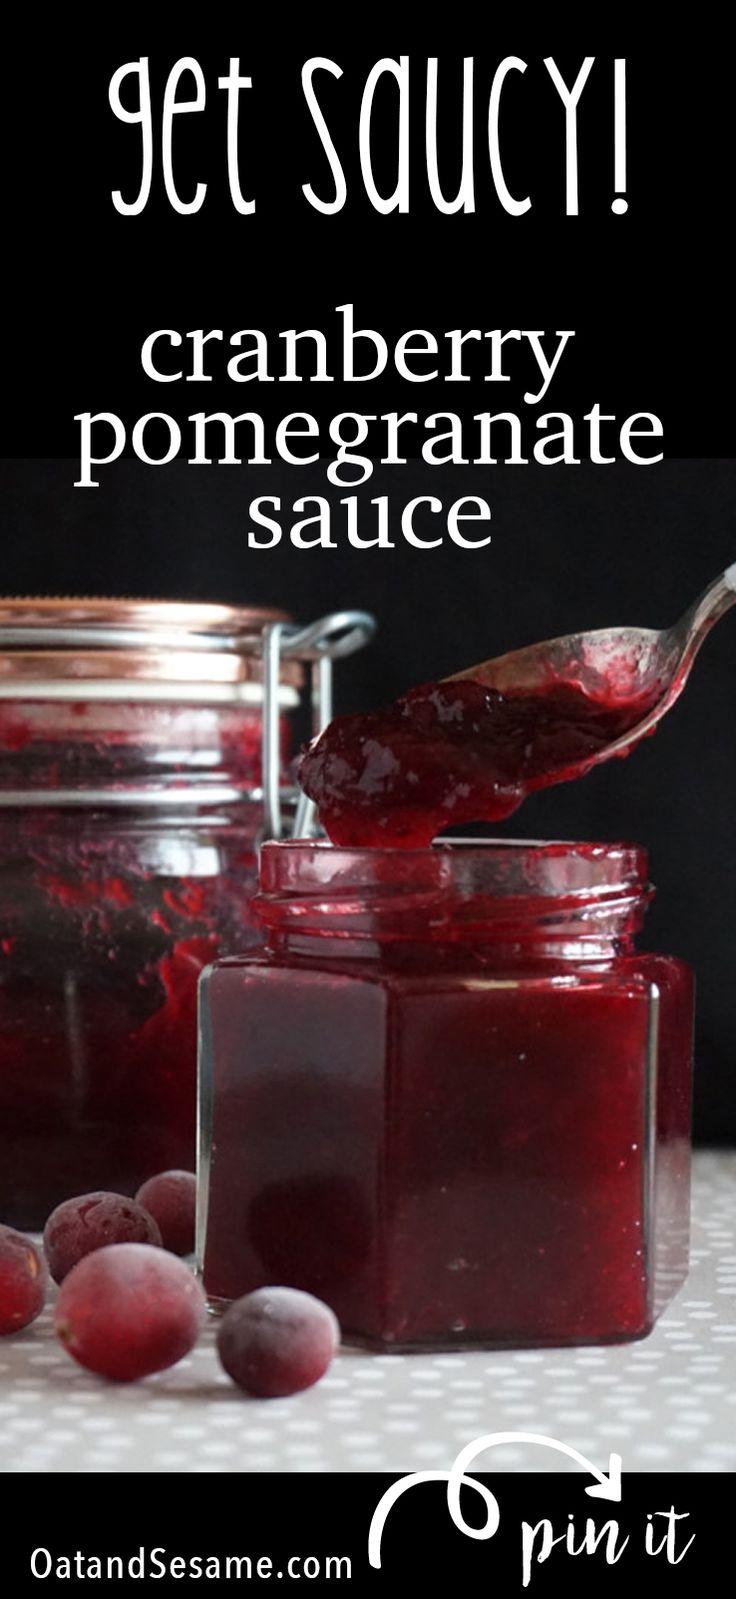 Cranberry Pomegranate Sauce   recipe at OatandSesame.com